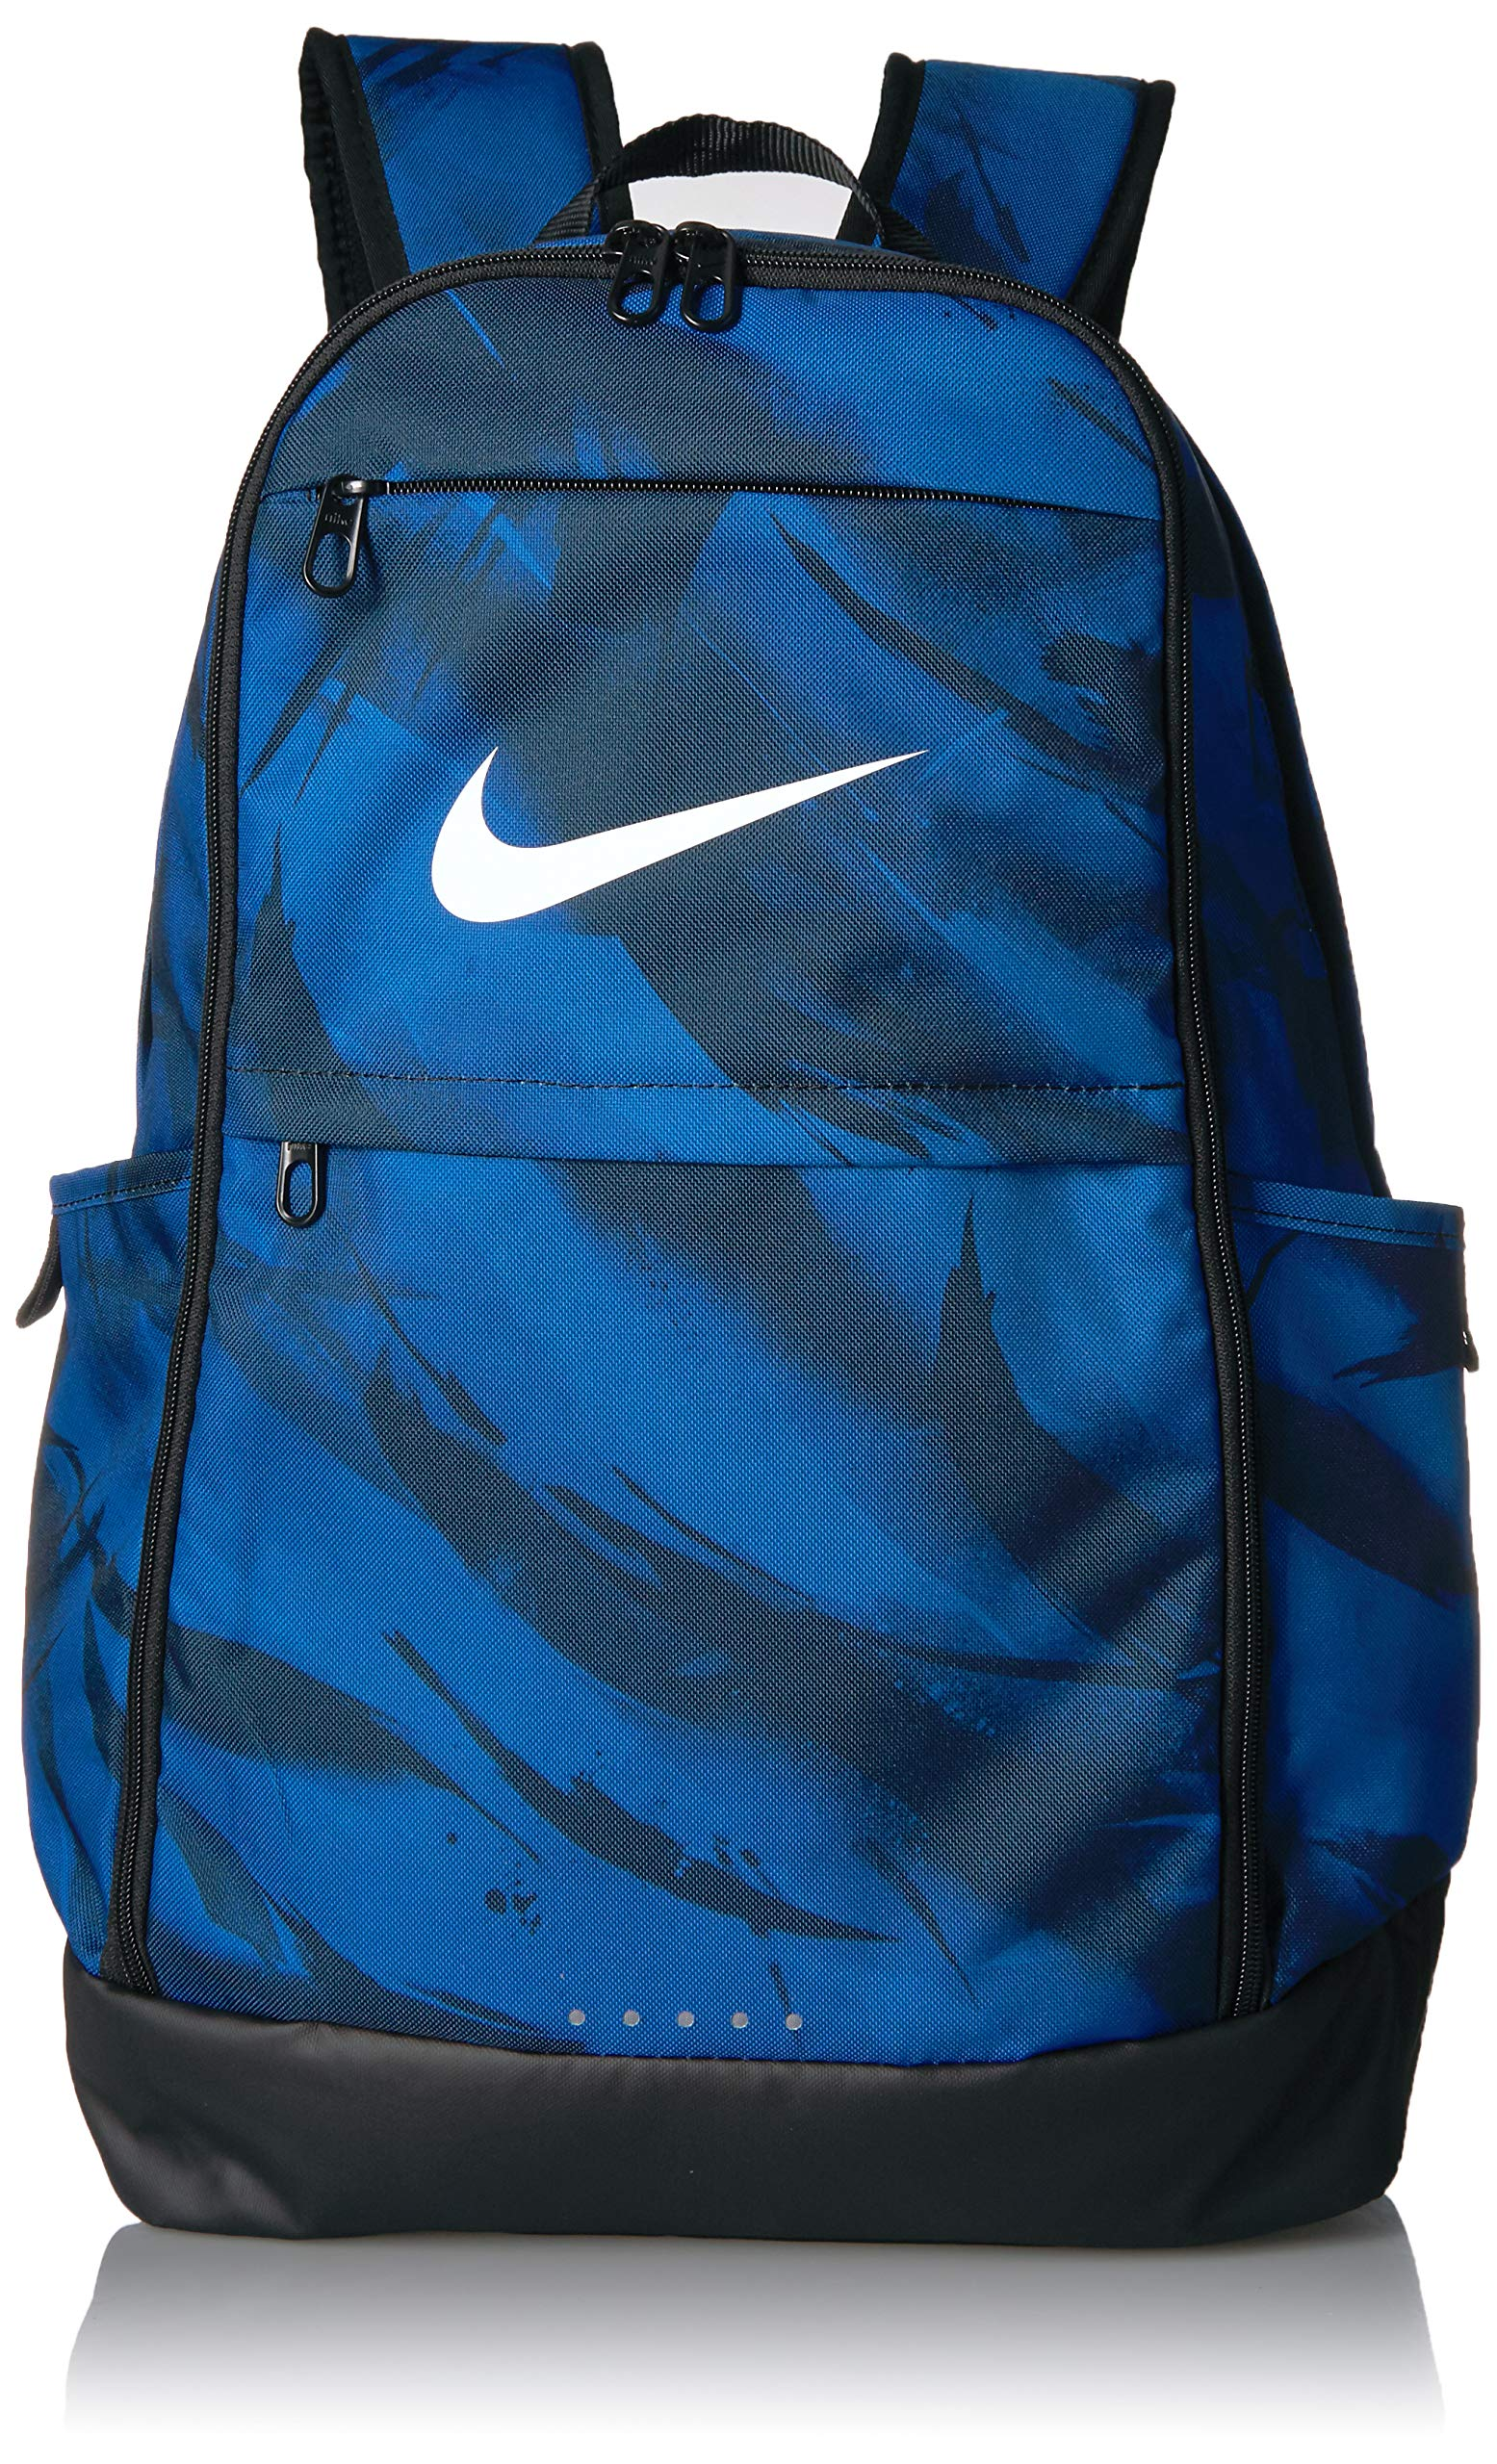 0062fcd227 Amazon.com  NIKE  Backpacks and Bags